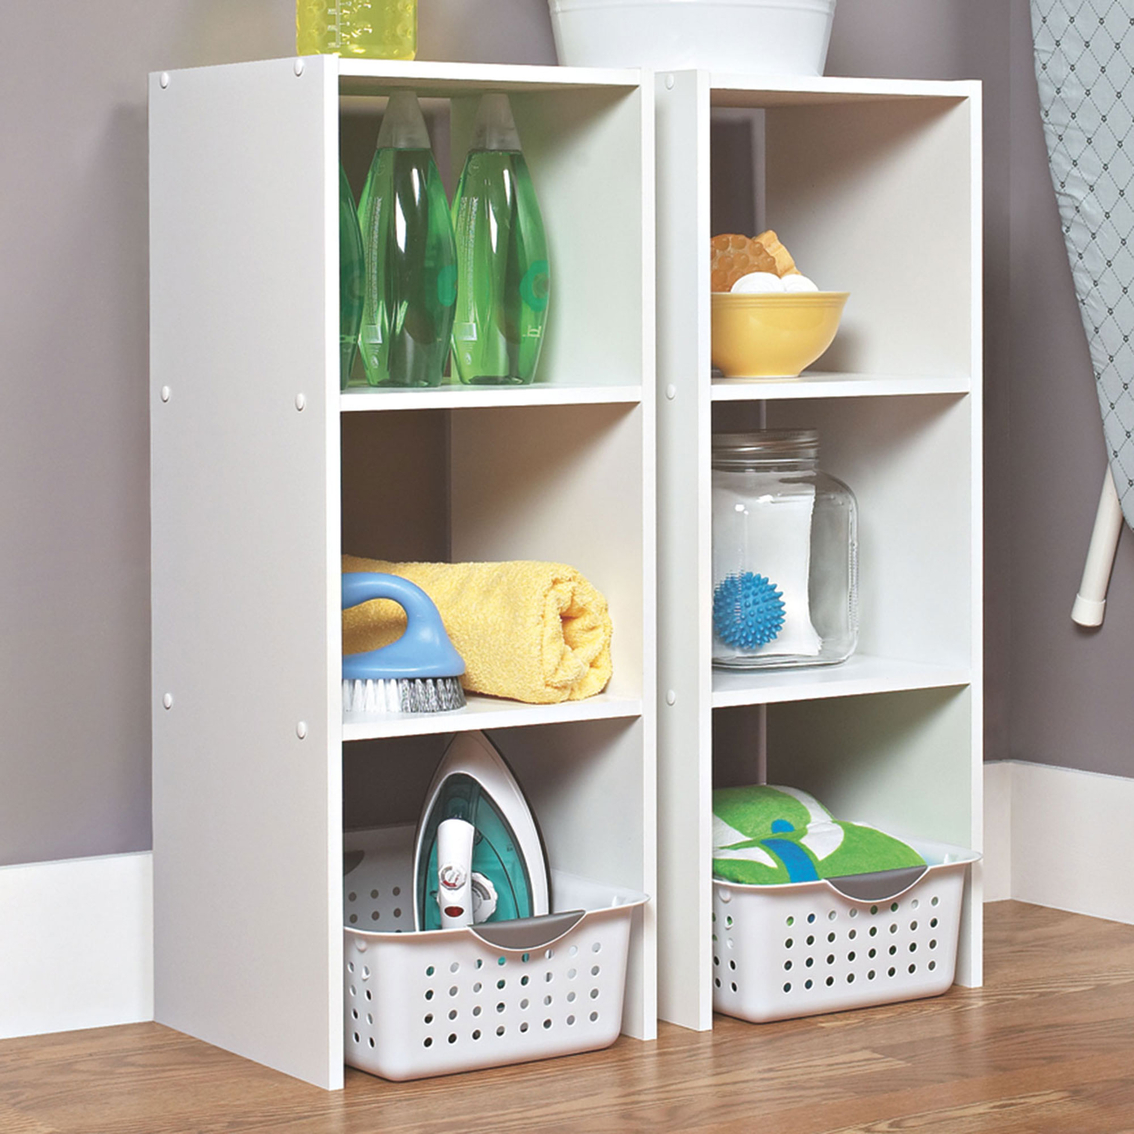 homes cube better ideas pin and gardens diy s best organizer shelf bhg